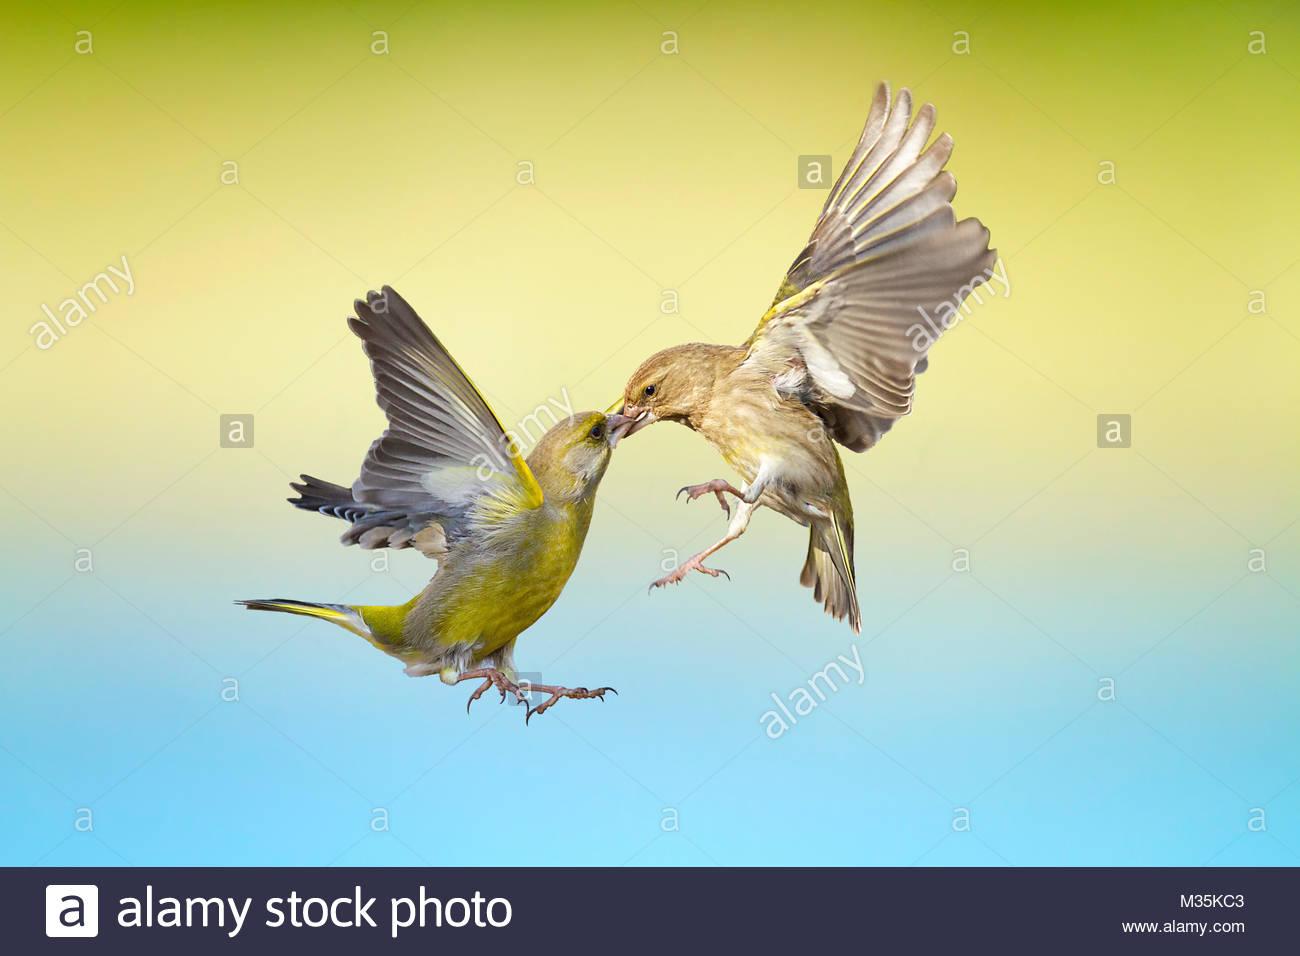 Flying kiss man